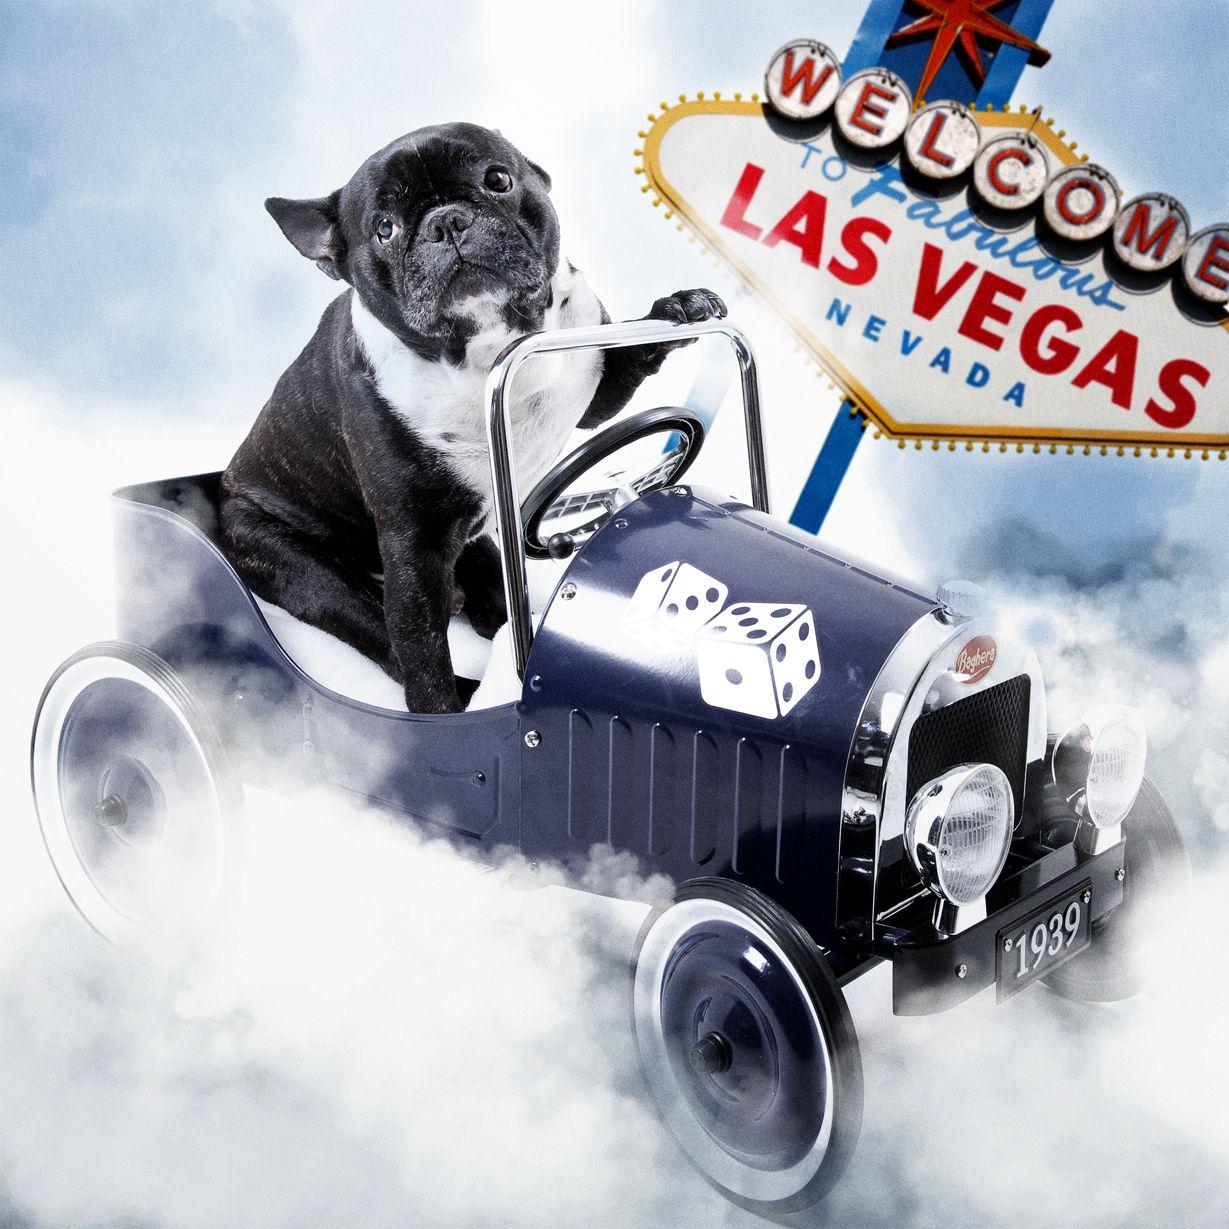 French Bulldog Las Vegas French Bulldog Las Vegas Bulldog